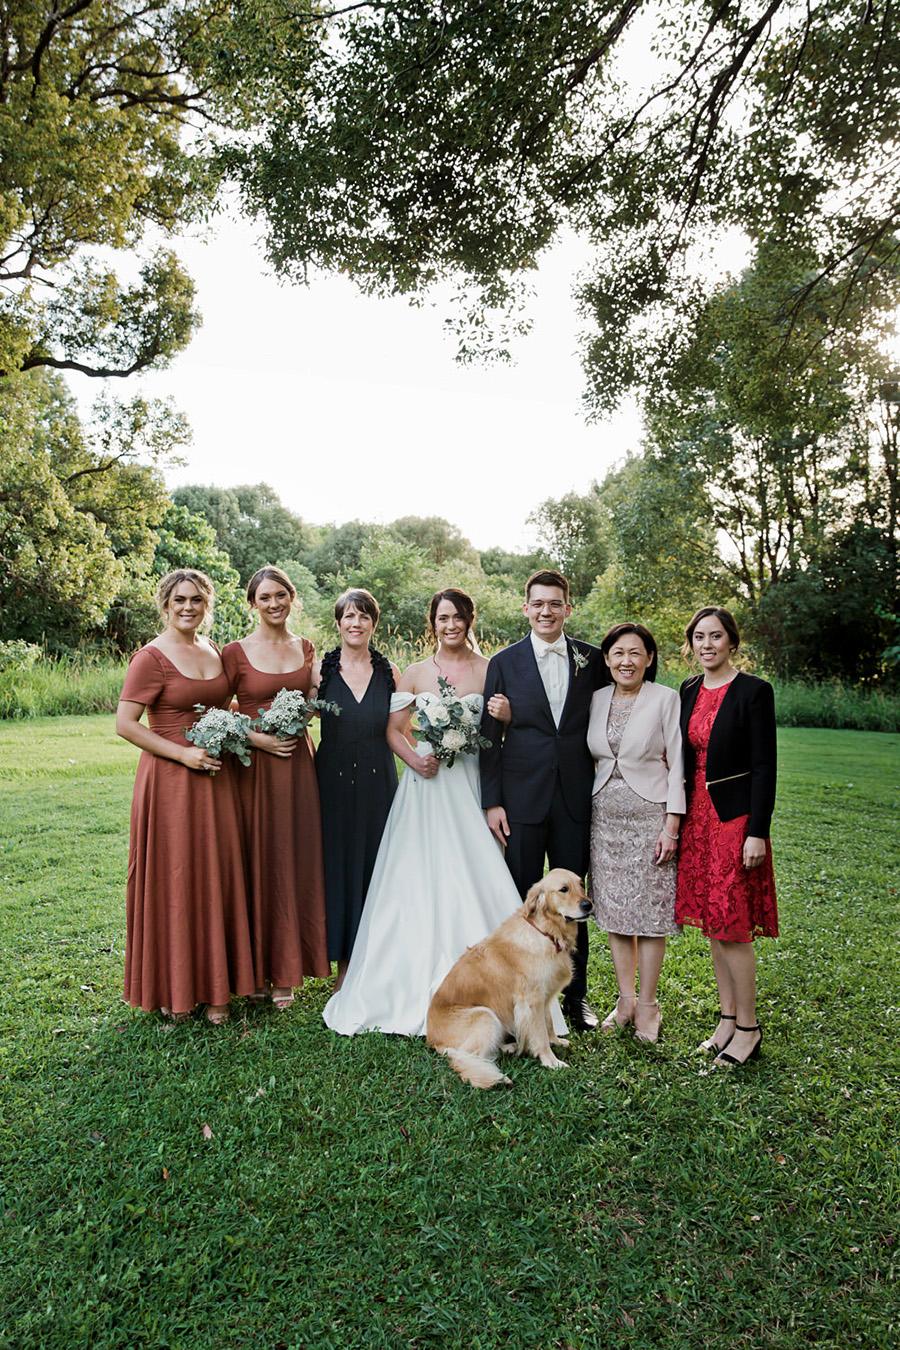 QuinceandMulberryStudios-Honest, natural, fun, romantic family-wedding-photography in brisbane queensland